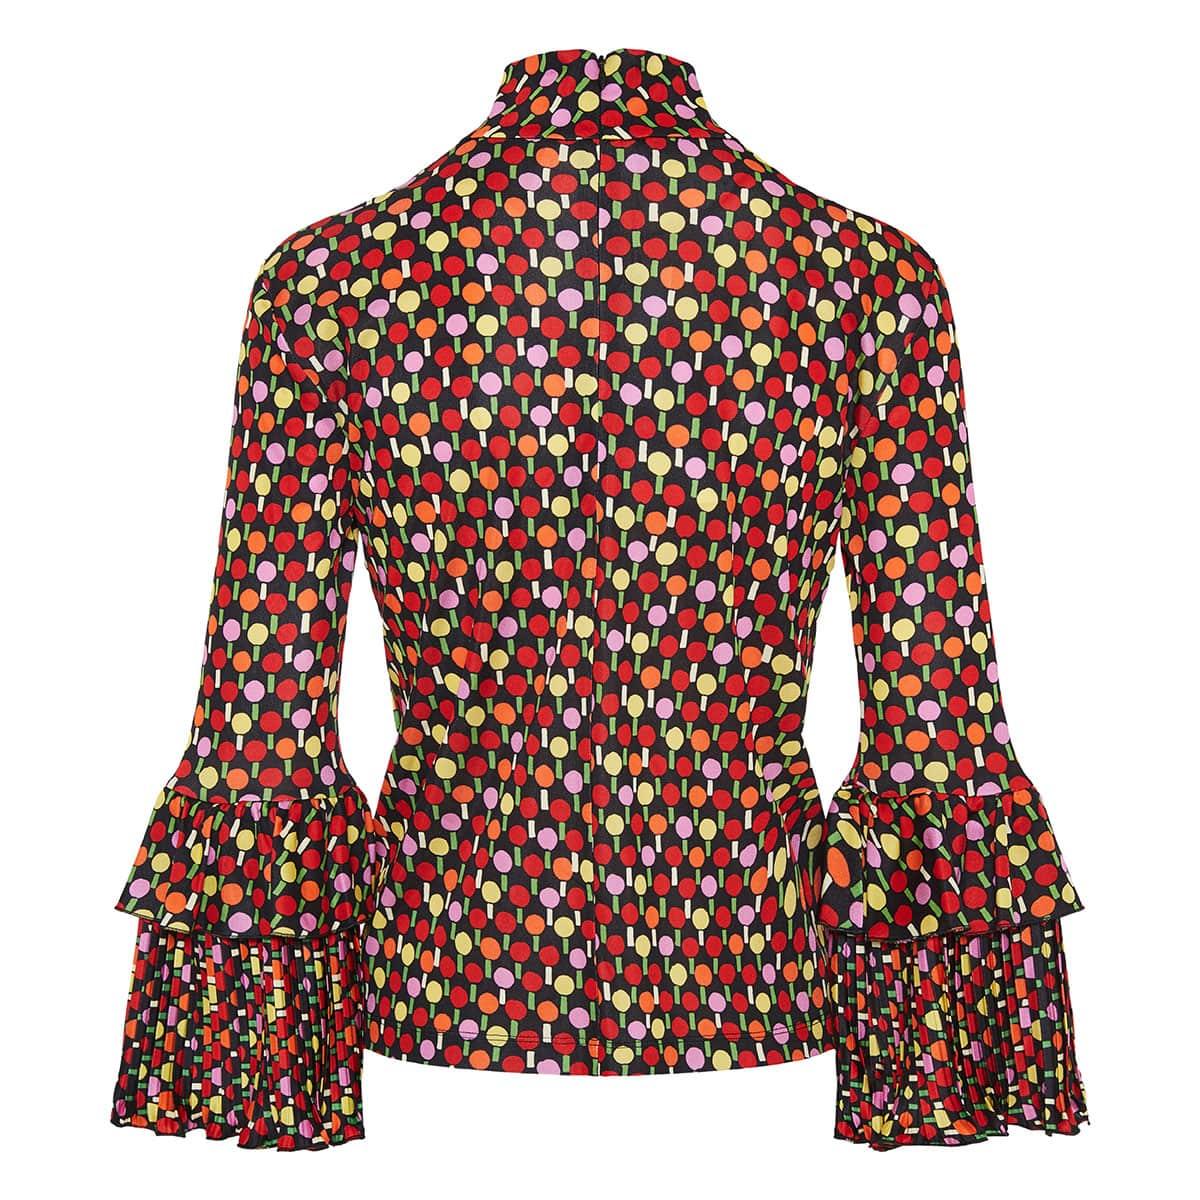 Ping pong print ruffled-cuff blouse